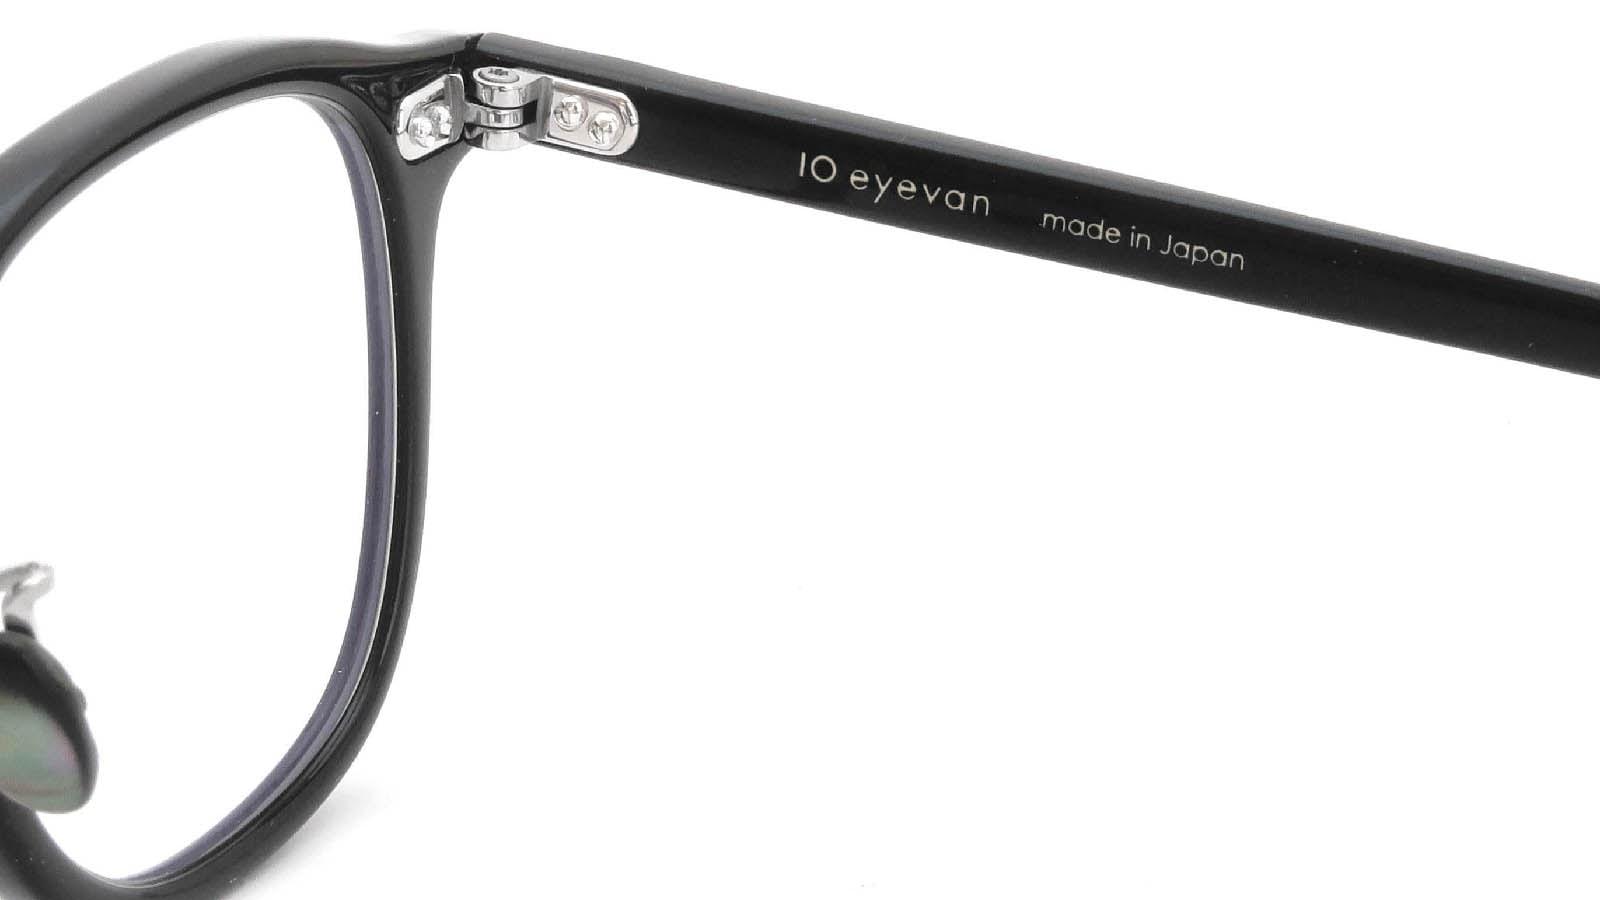 10 eyevan NO.7 Ⅲ 45size 11